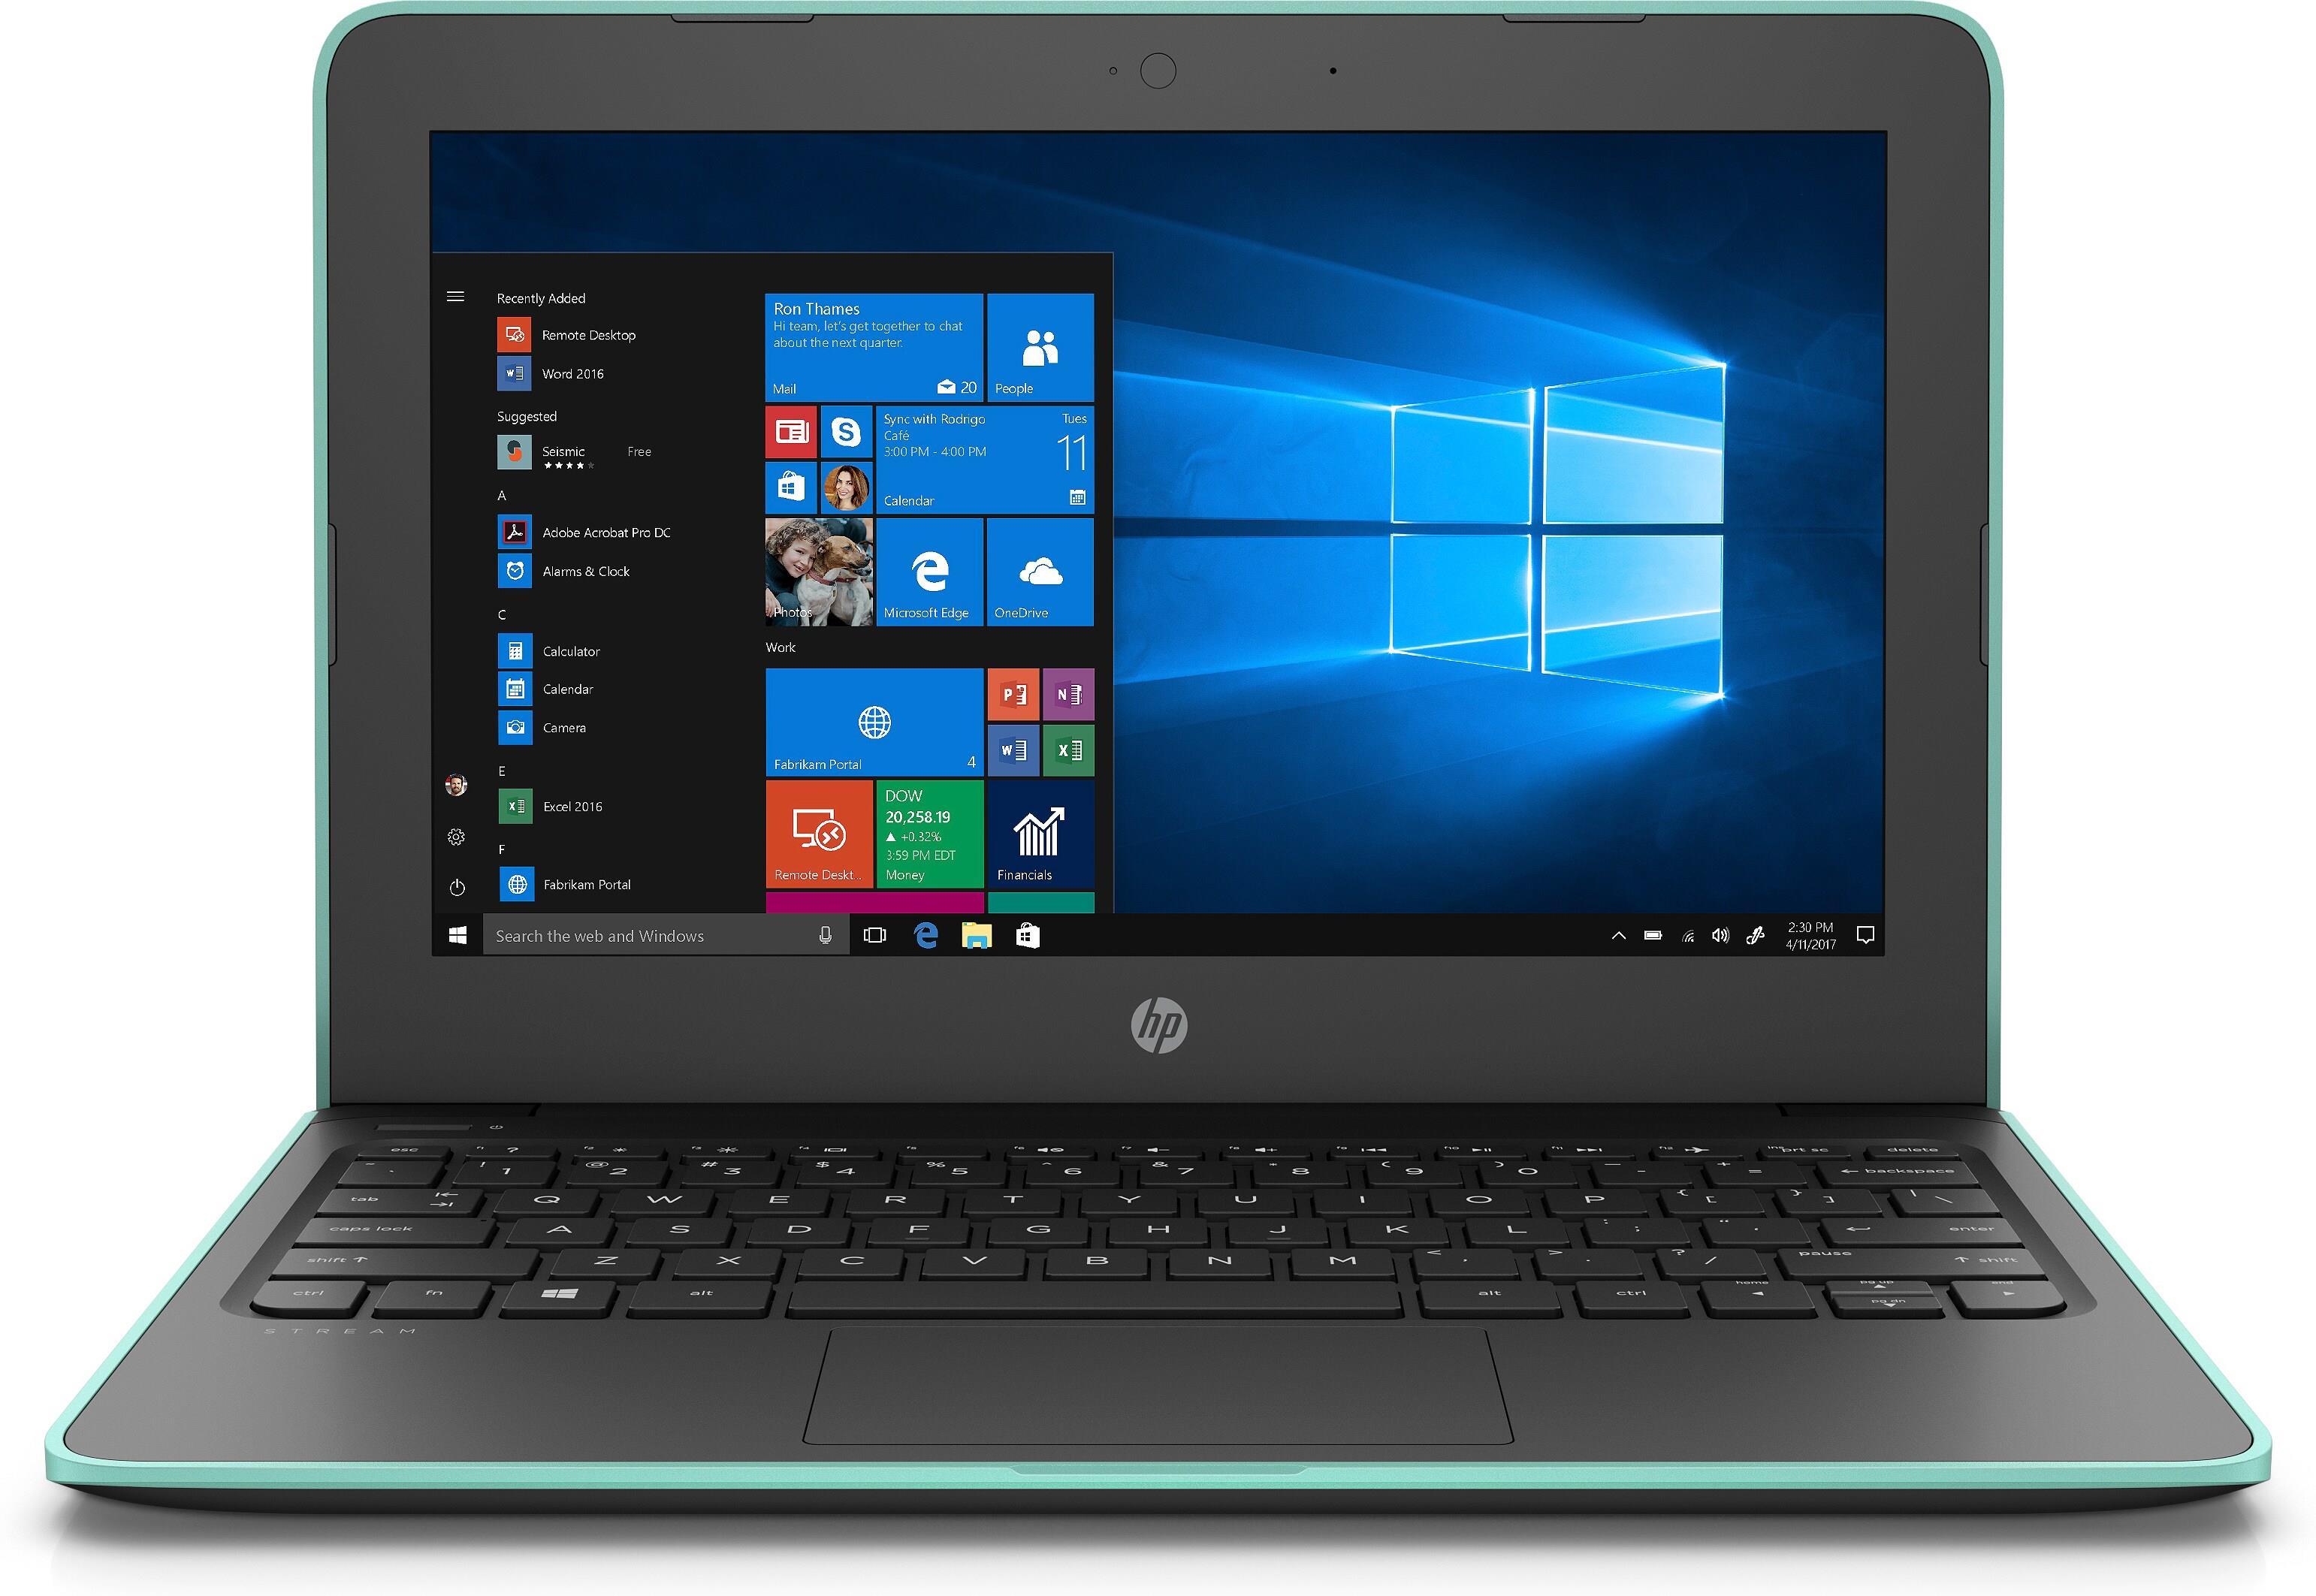 HP Stream 11 Pro G5 (11.6 inch) Notebook PC Celeron (N4100) 1.1GHz 4GB 64GB eMMc Windows 10 Pro (UHD Graphics 600)